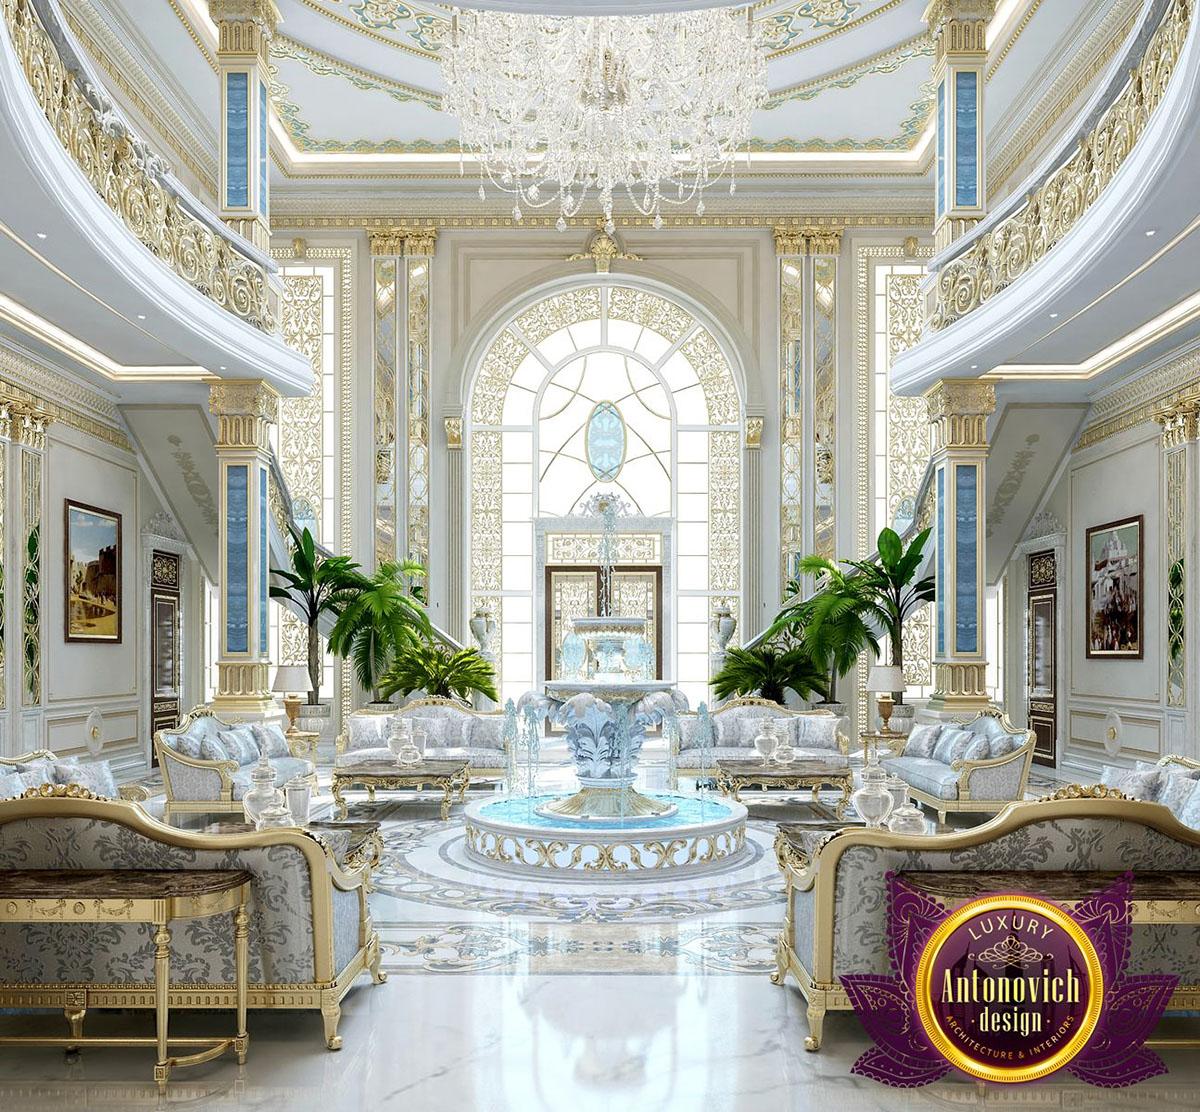 Katrina Antonovich Luxury Interior Design: The Best Interior Design Villa By Katrina Antonovich On